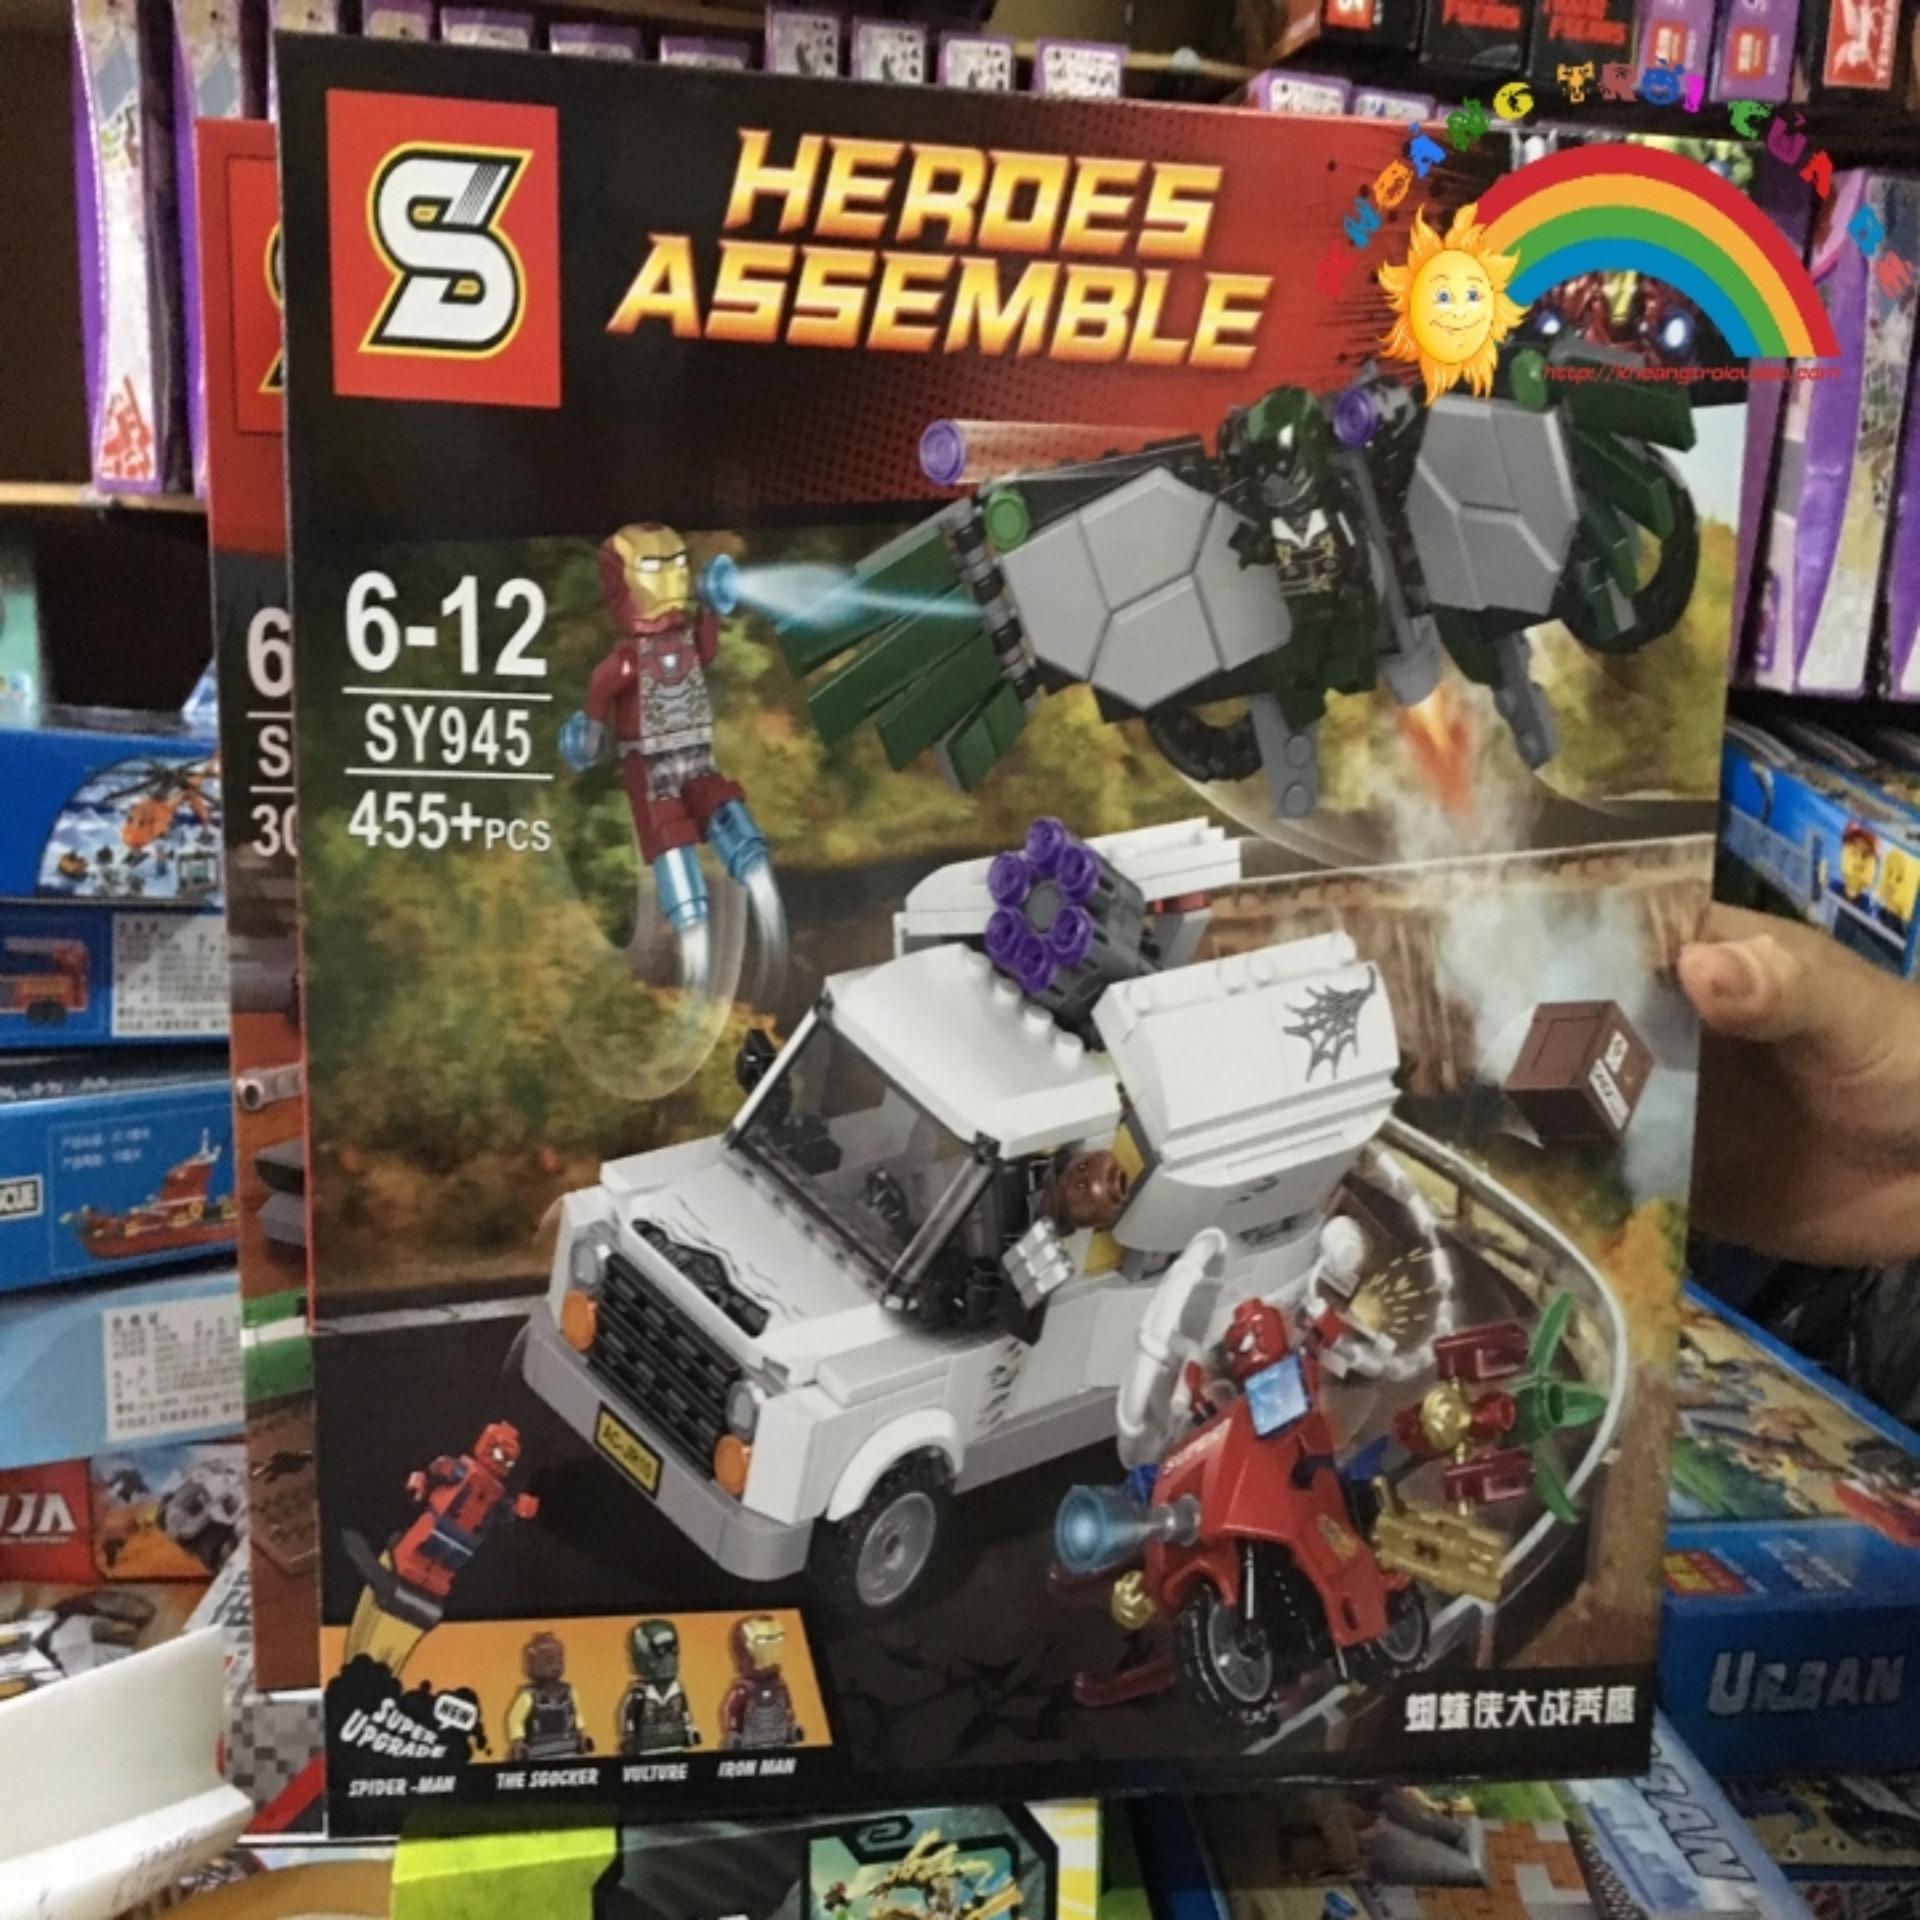 Lego Hero Assenble Sy945 Kta875